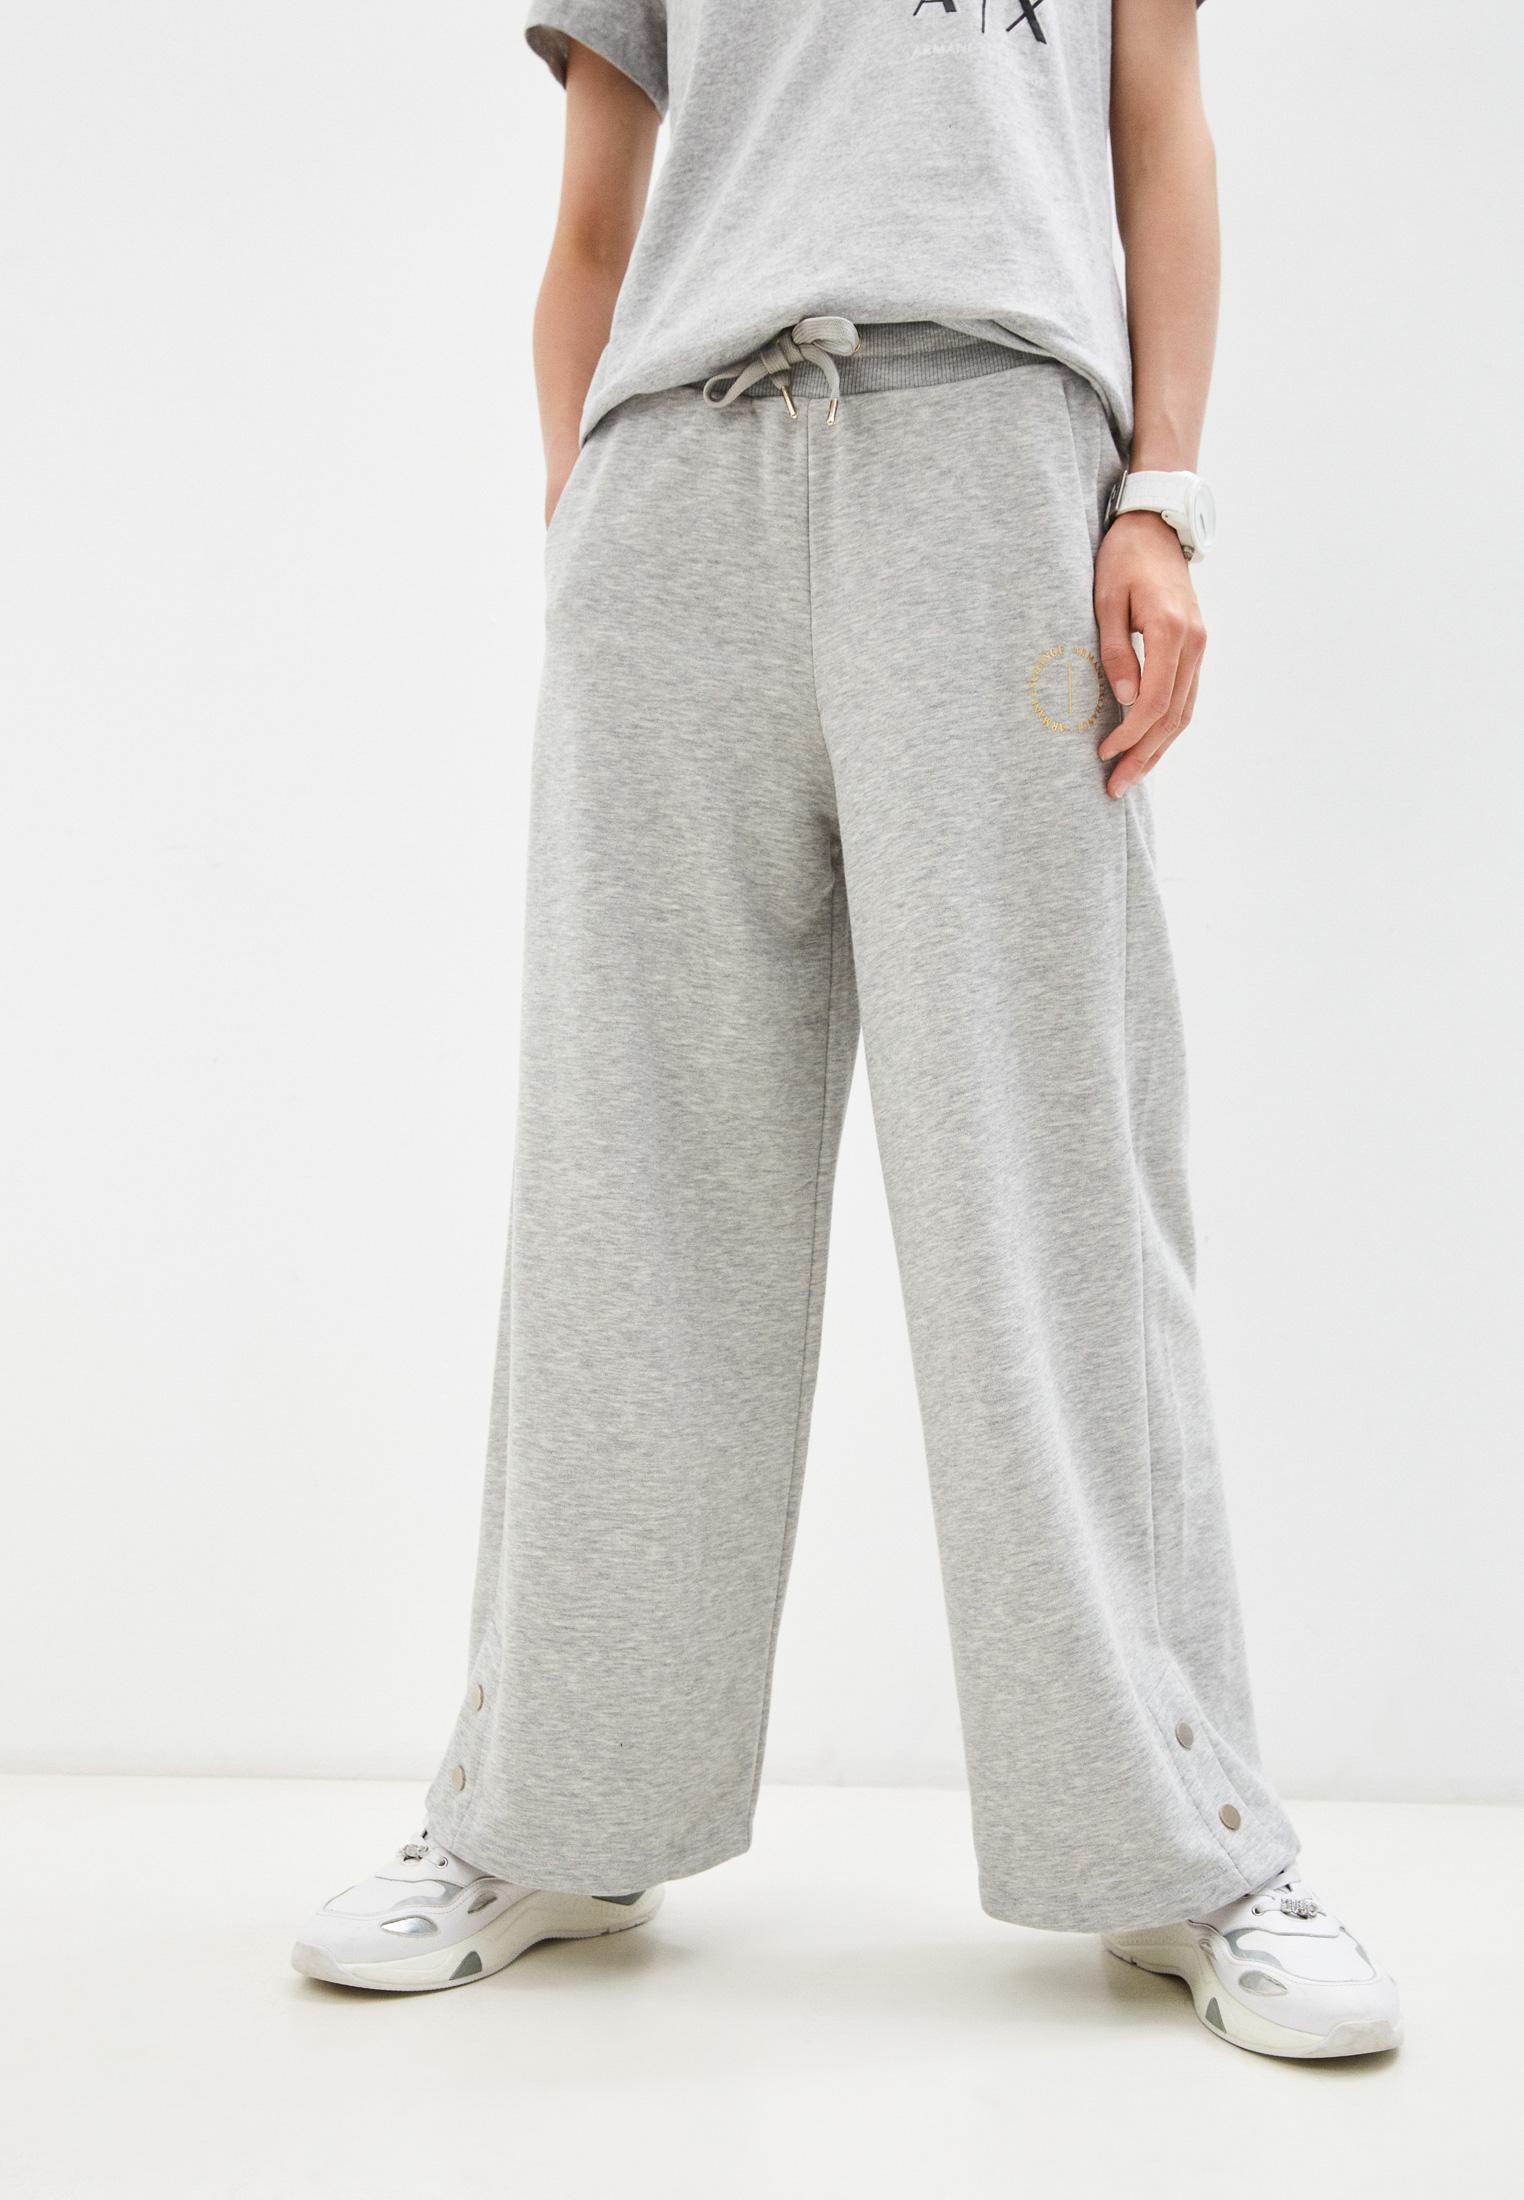 Женские спортивные брюки Armani Exchange Брюки спортивные Armani Exchange